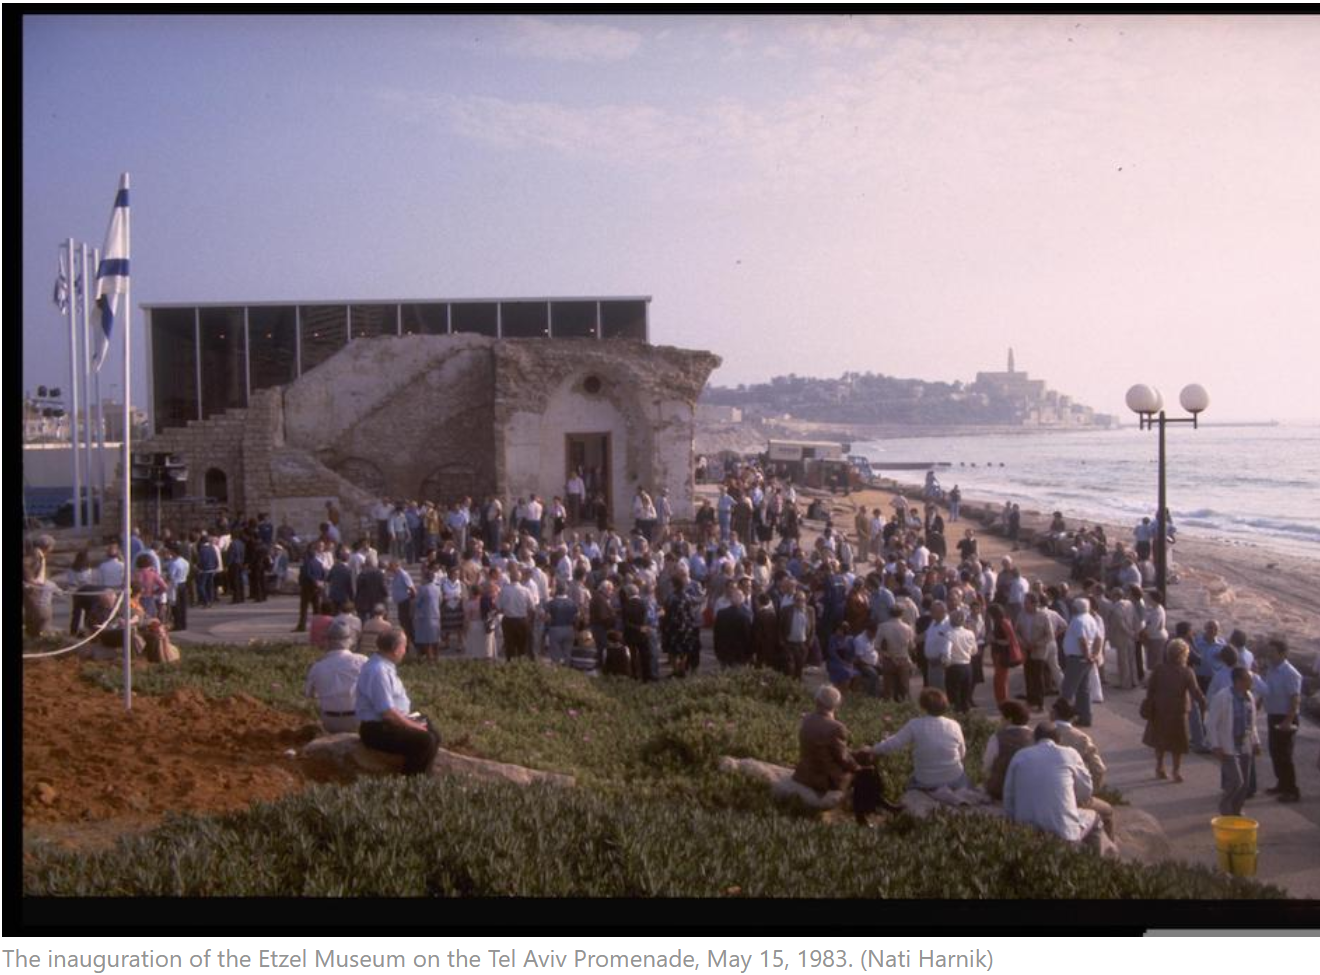 The inauguration of the Etzel Museum on the Tel Aviv Promenade, May 15, 1983.